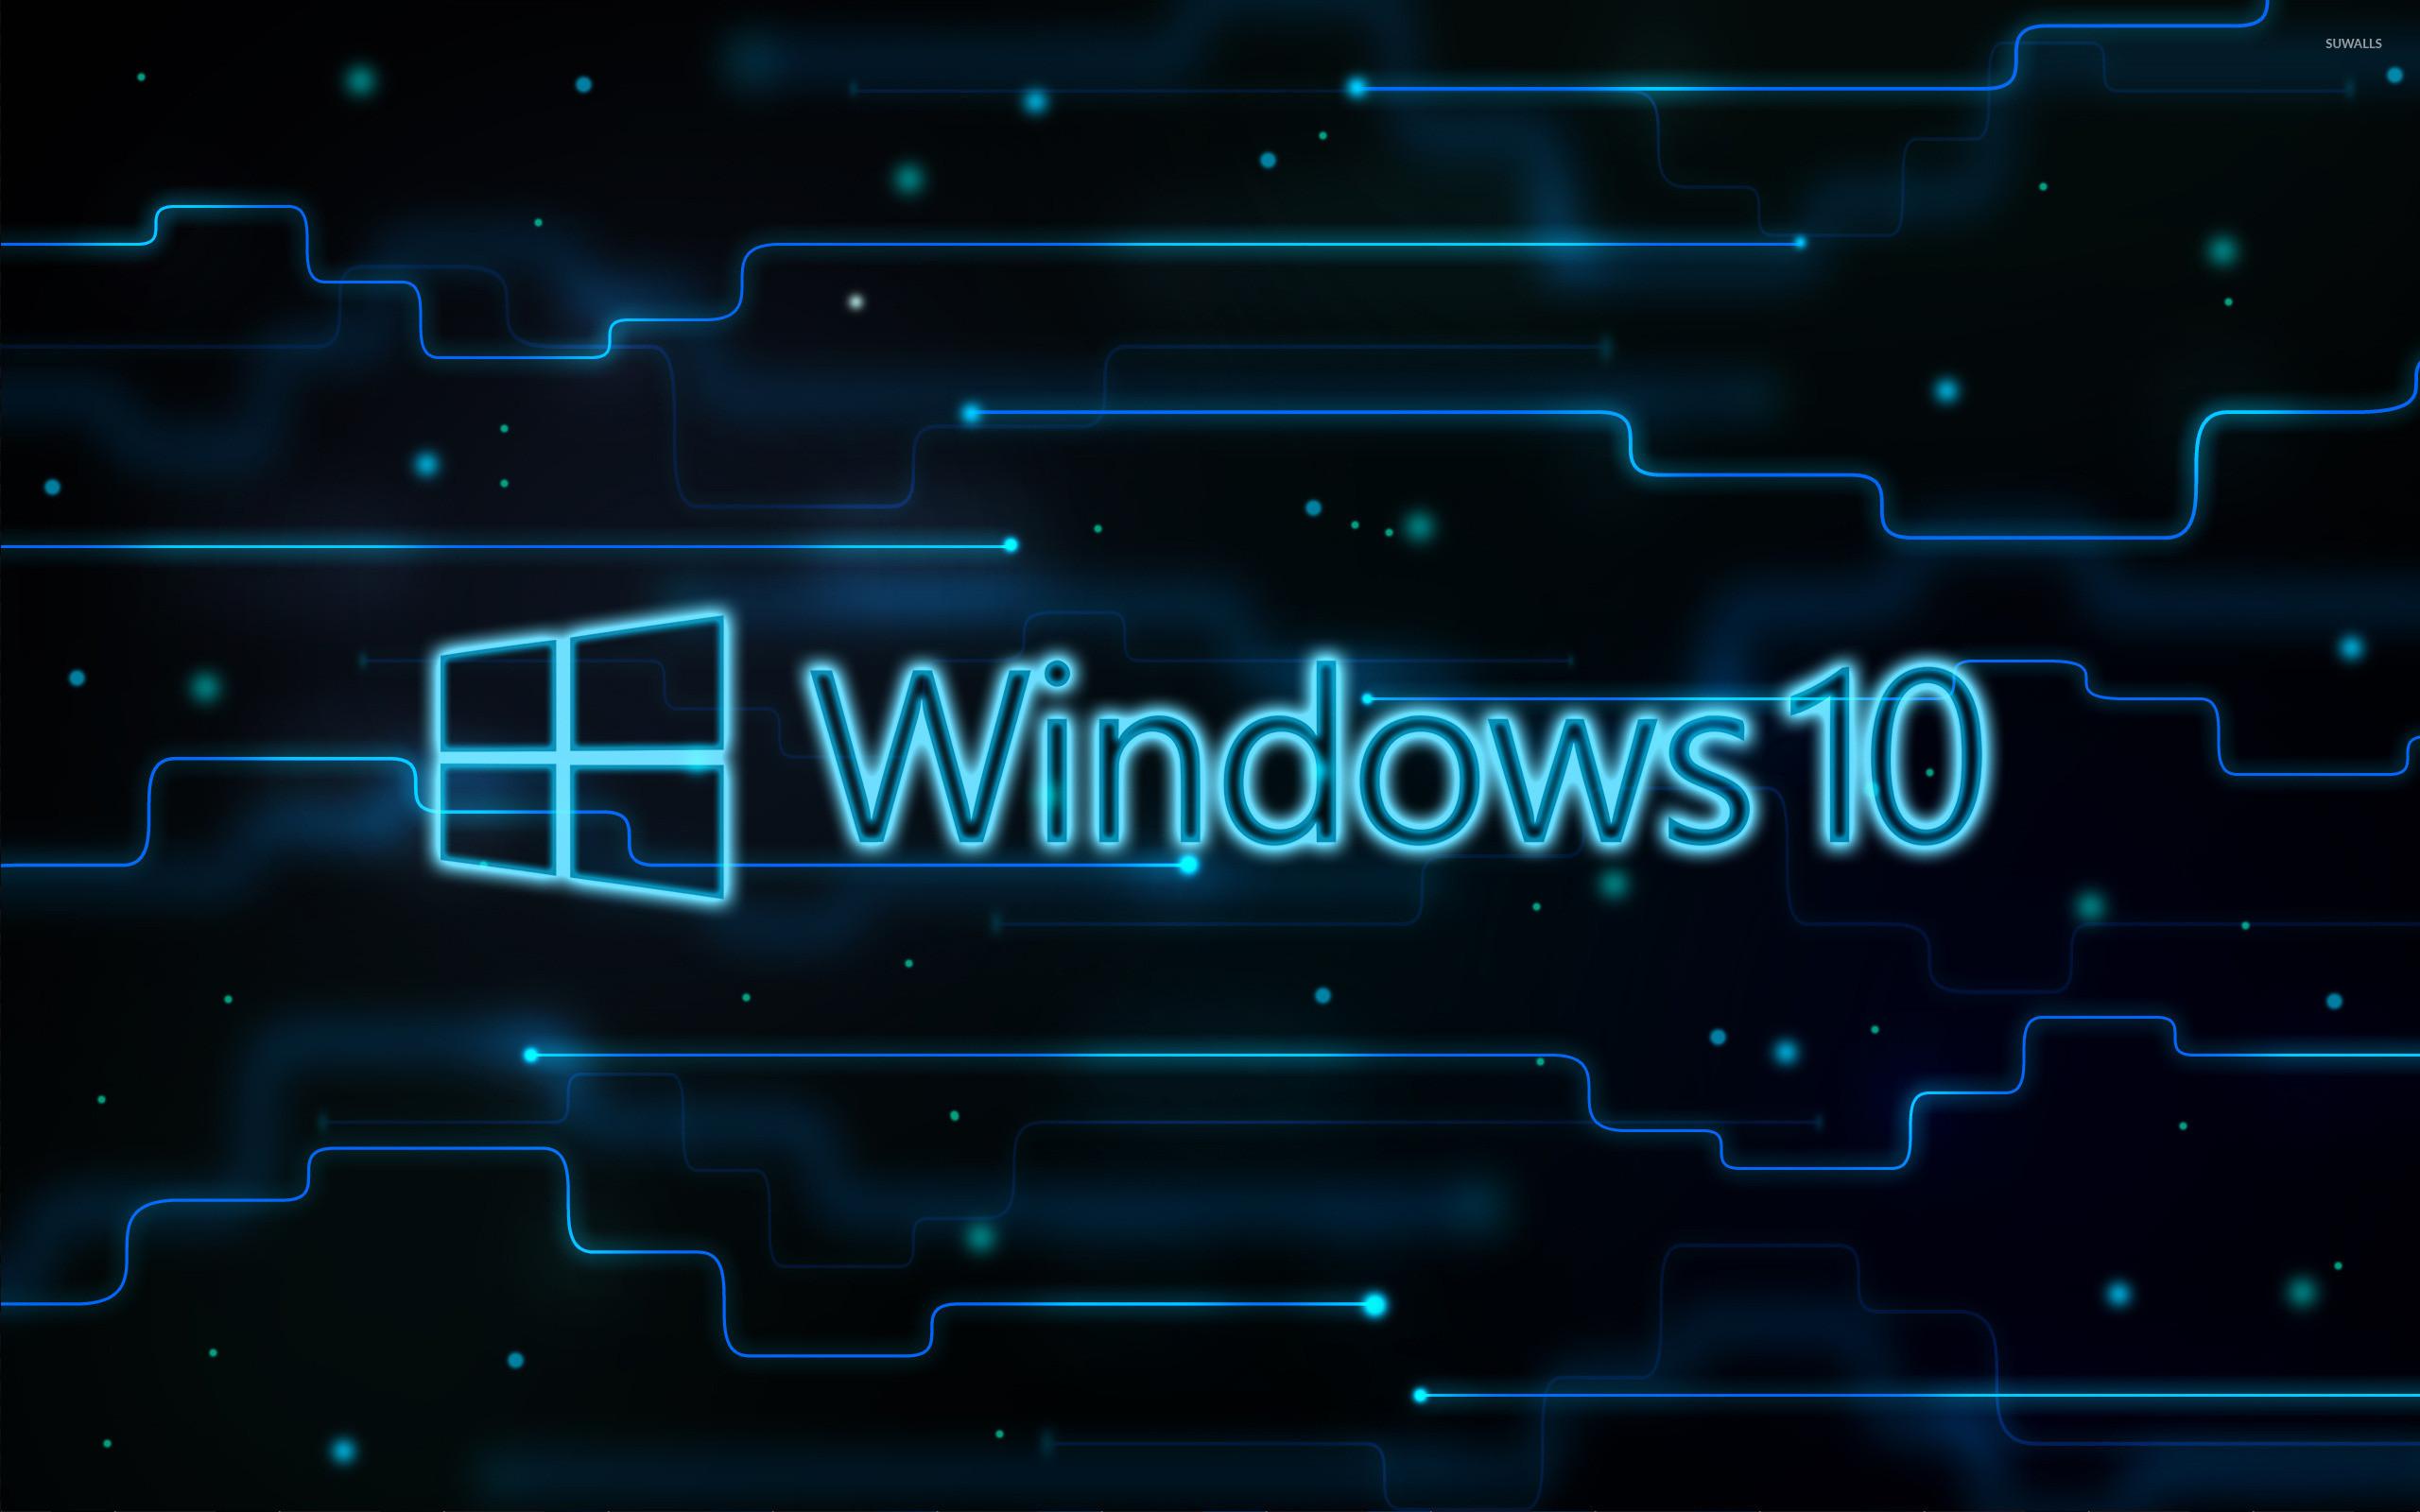 Windows 10 wallpaper – Computer wallpapers – #45281